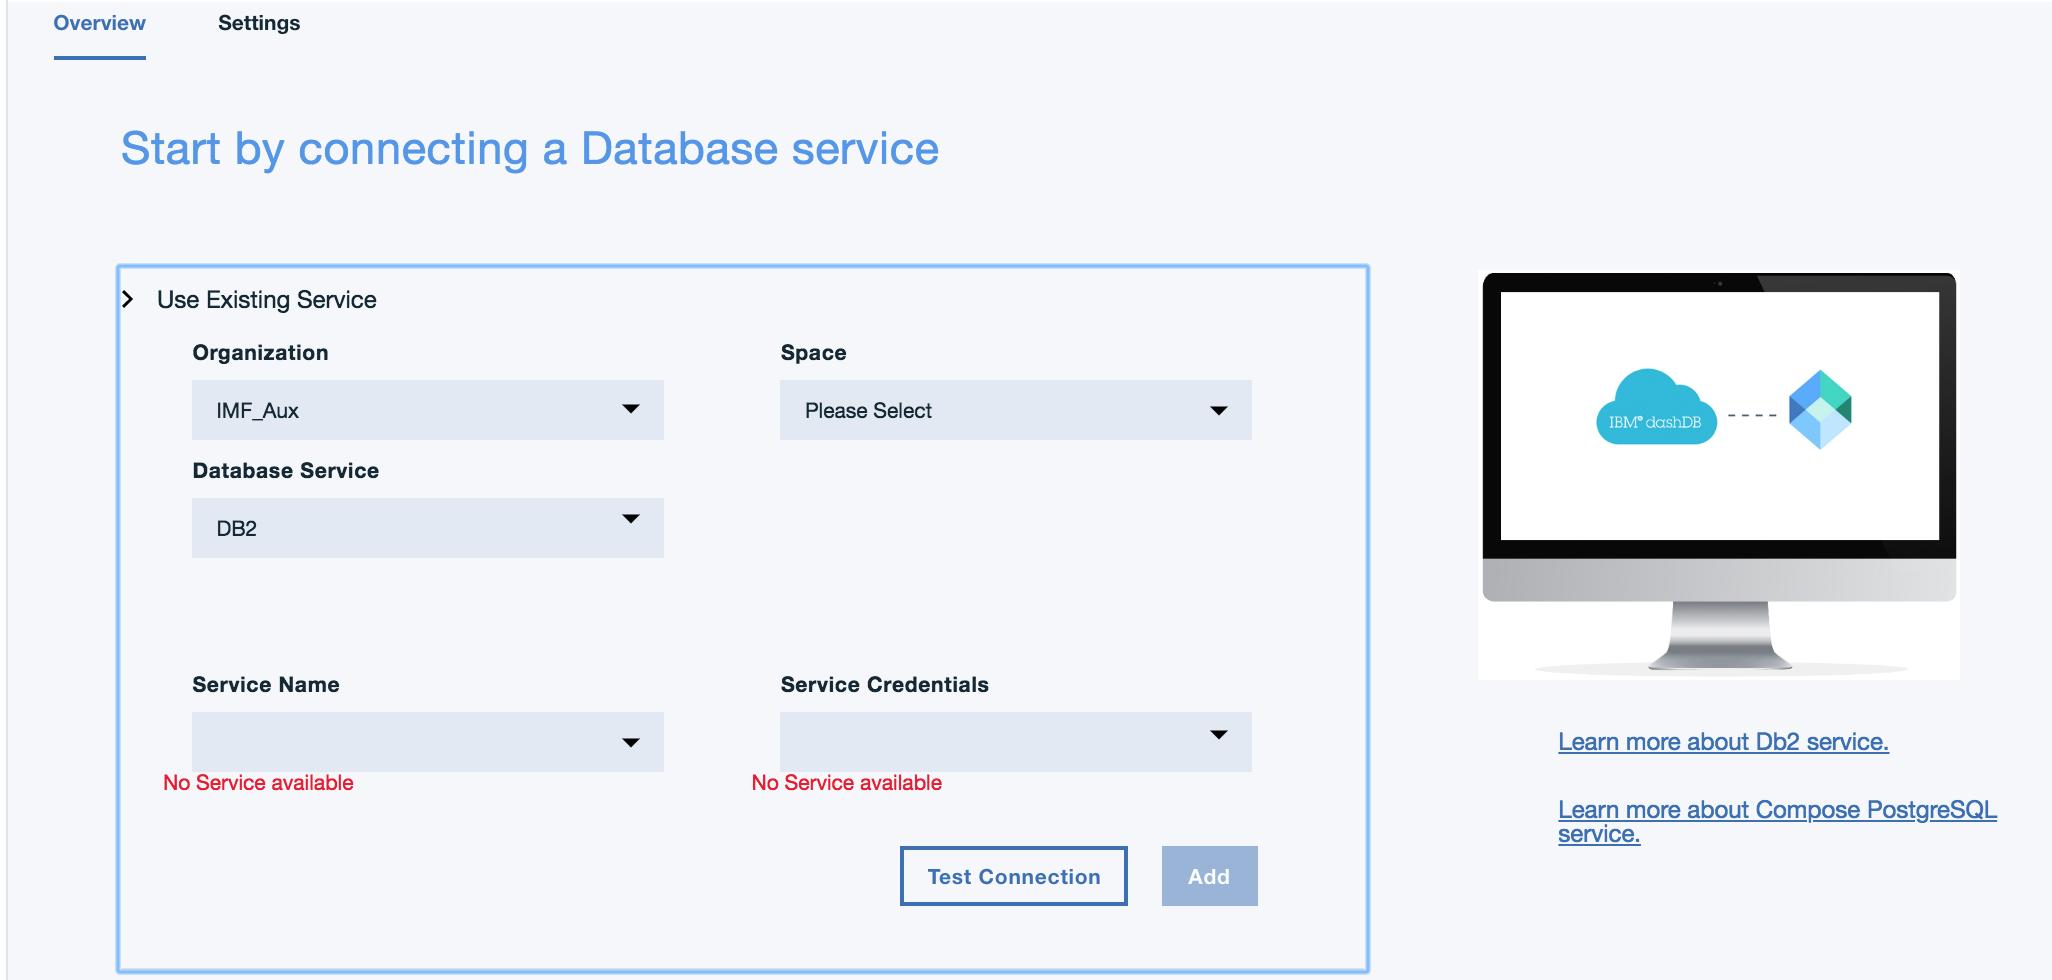 Using Mobile Foundation service on IBM Cloud - IBM Mobile